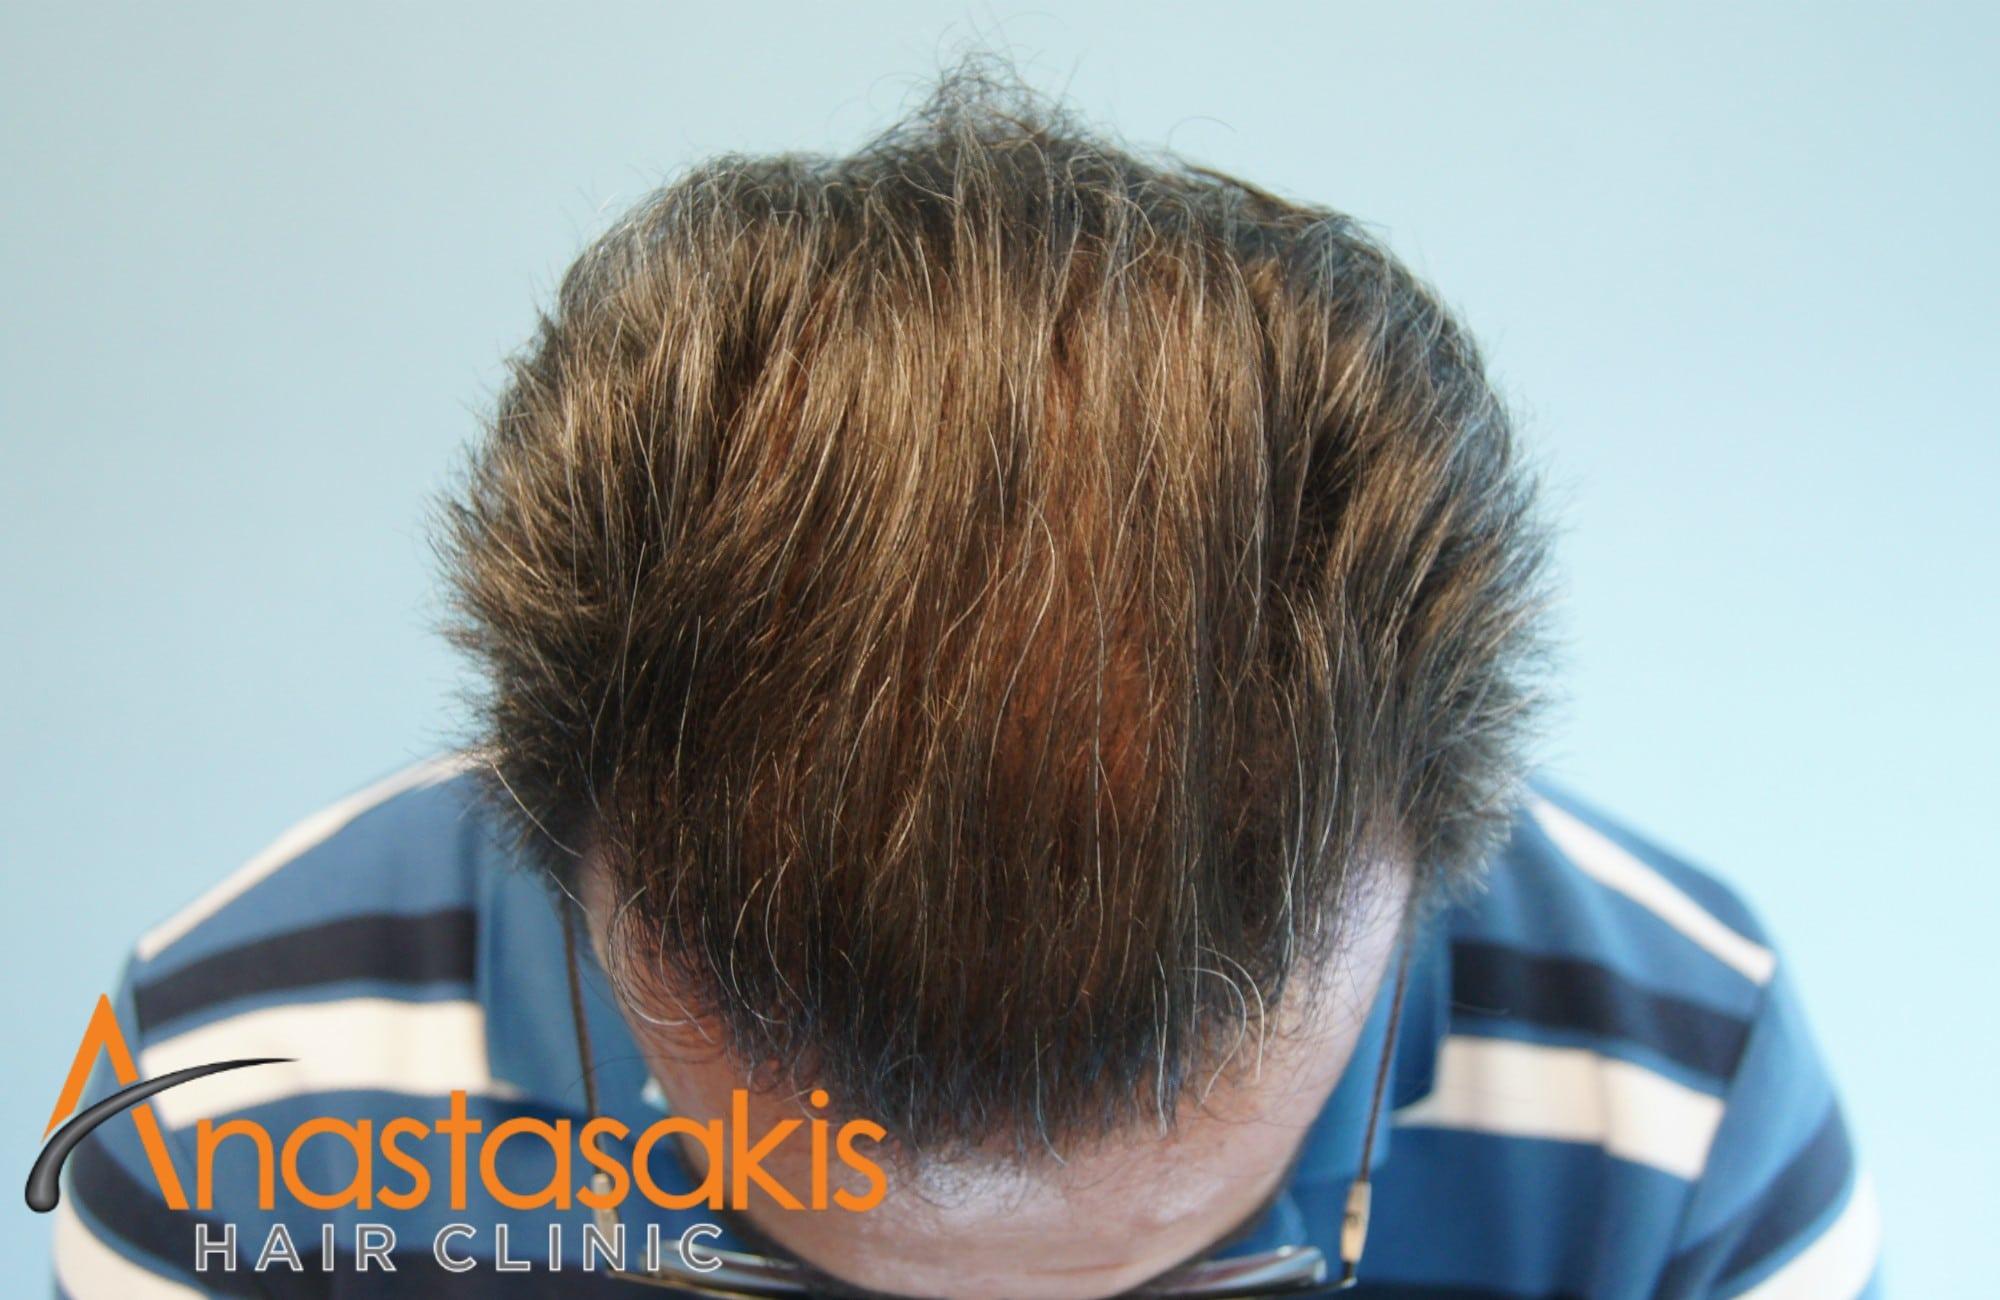 bird view ασθενούς μετά τη μεταμοσχευση μαλλιων με 3500 fus με τη μεθοδο fut